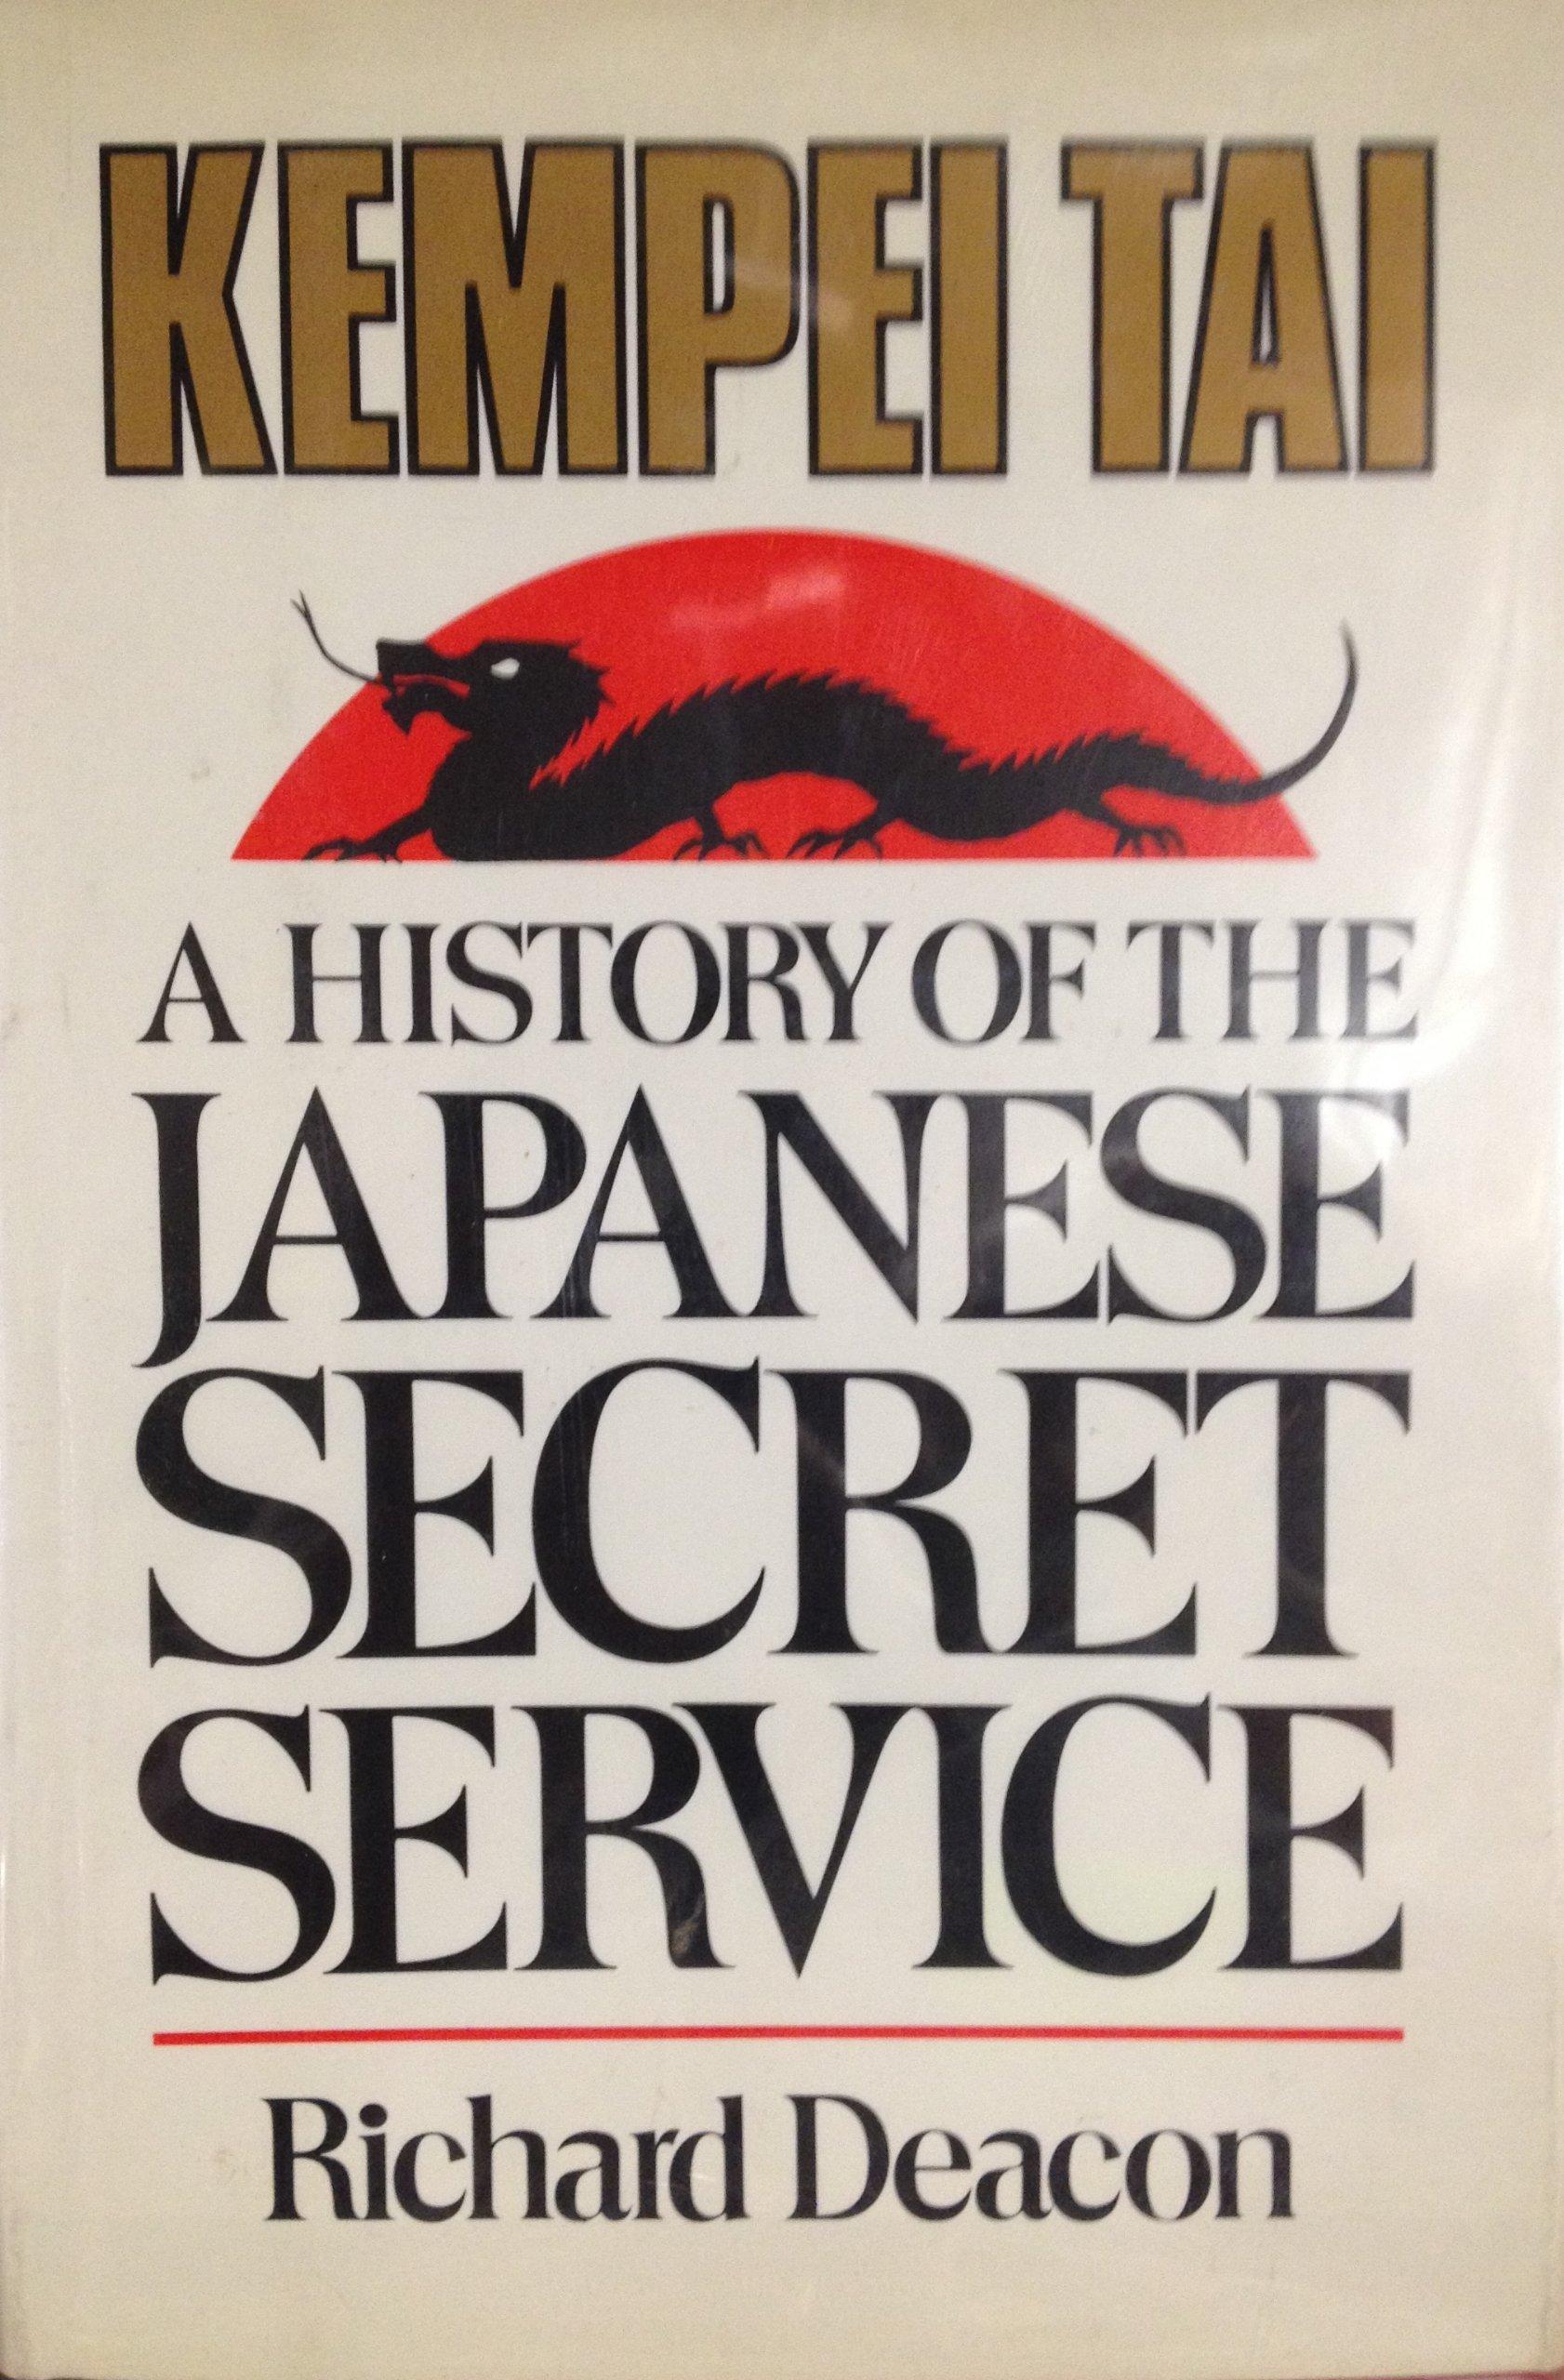 Kempei Tai: A History of the Japanese Secret Service: Amazon.co.uk: Richard  Deacon: 9780825301315: Books